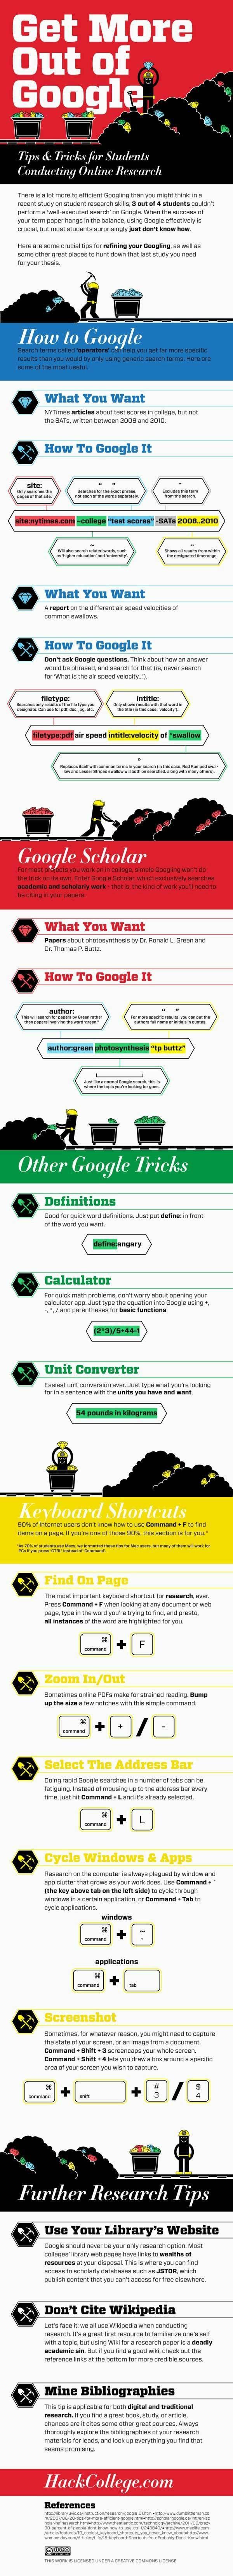 Useful information....